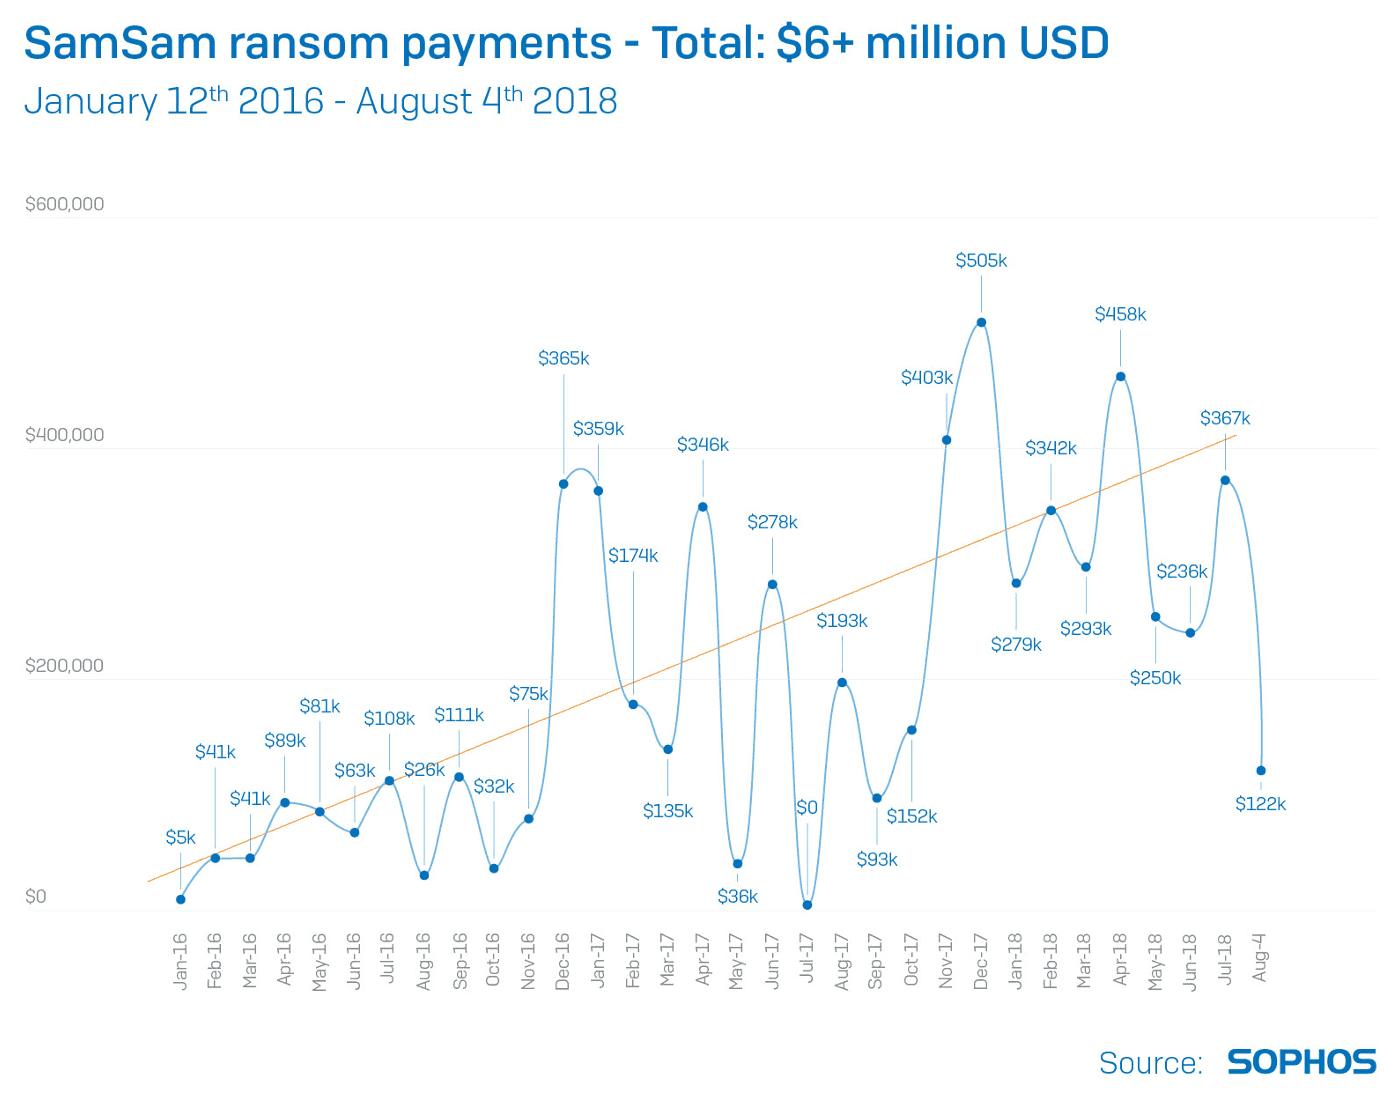 SamSam ransom collection over time